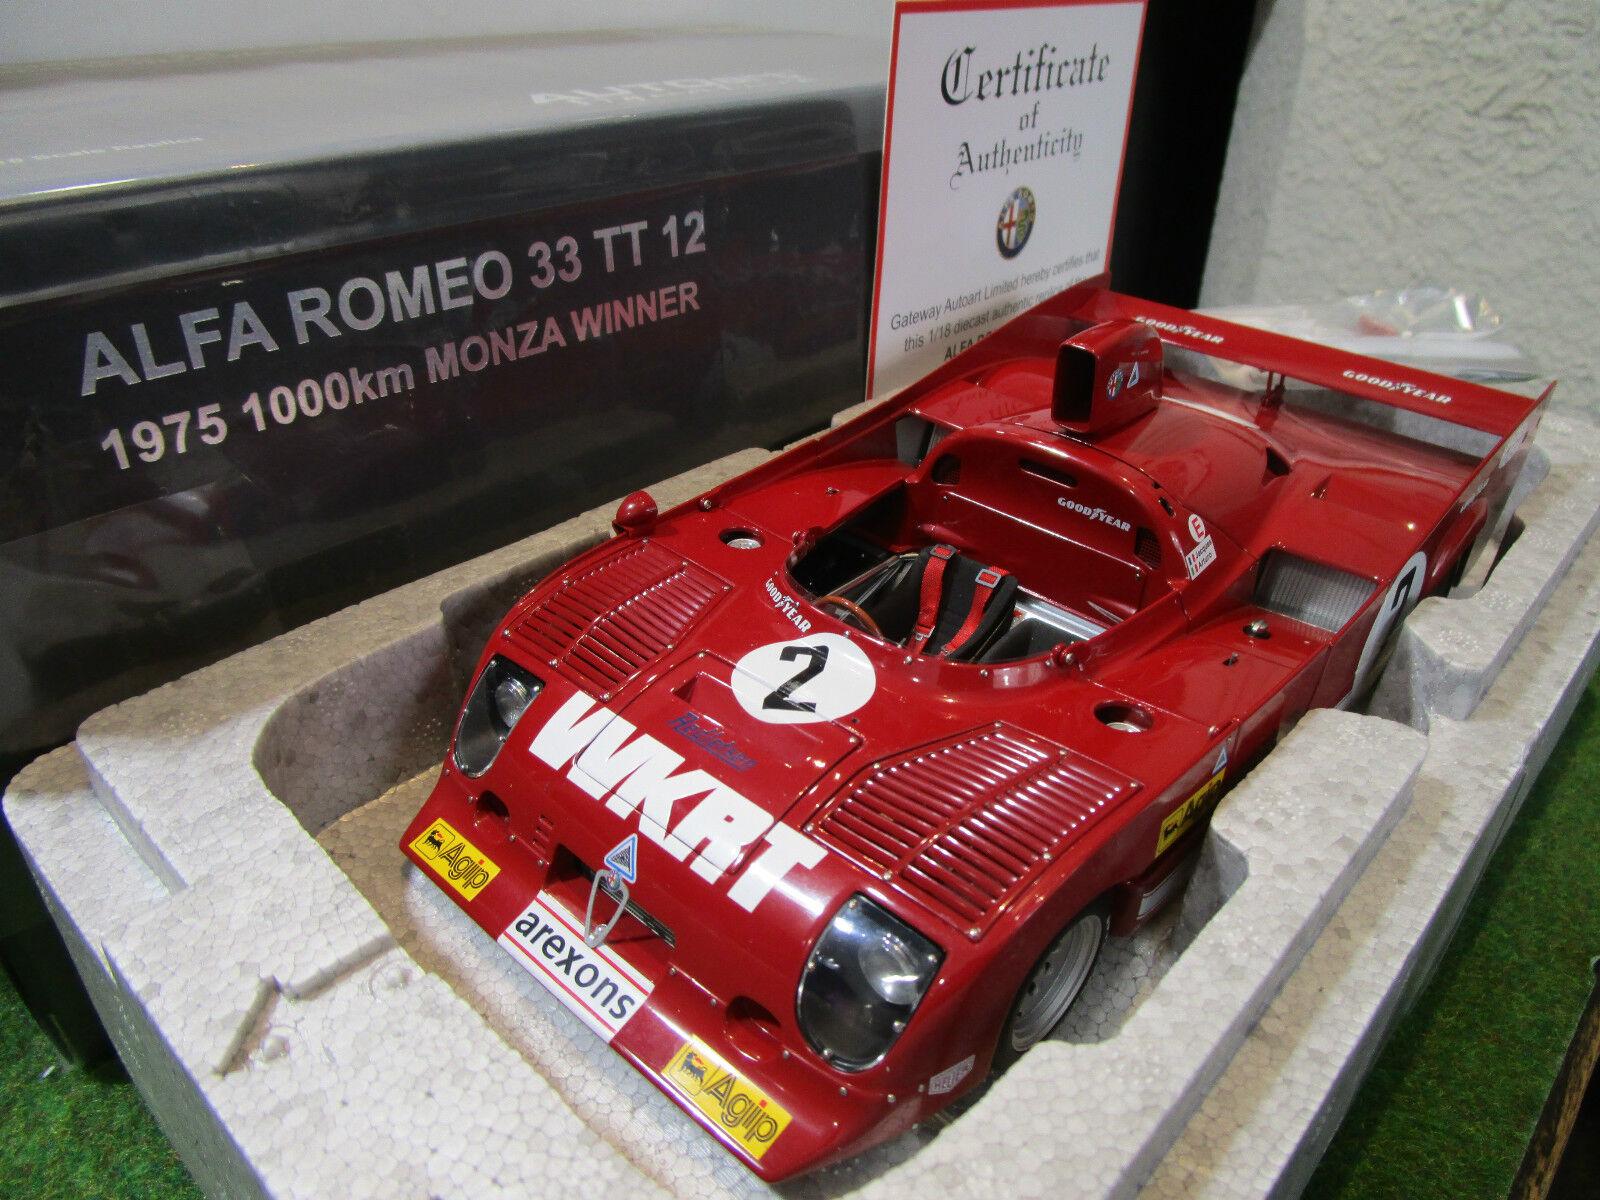 ALFA ROMEO 33 TT 12  2 WINNER MONZA 1975 au 1 18 AUTOART 87504 voiture miniature